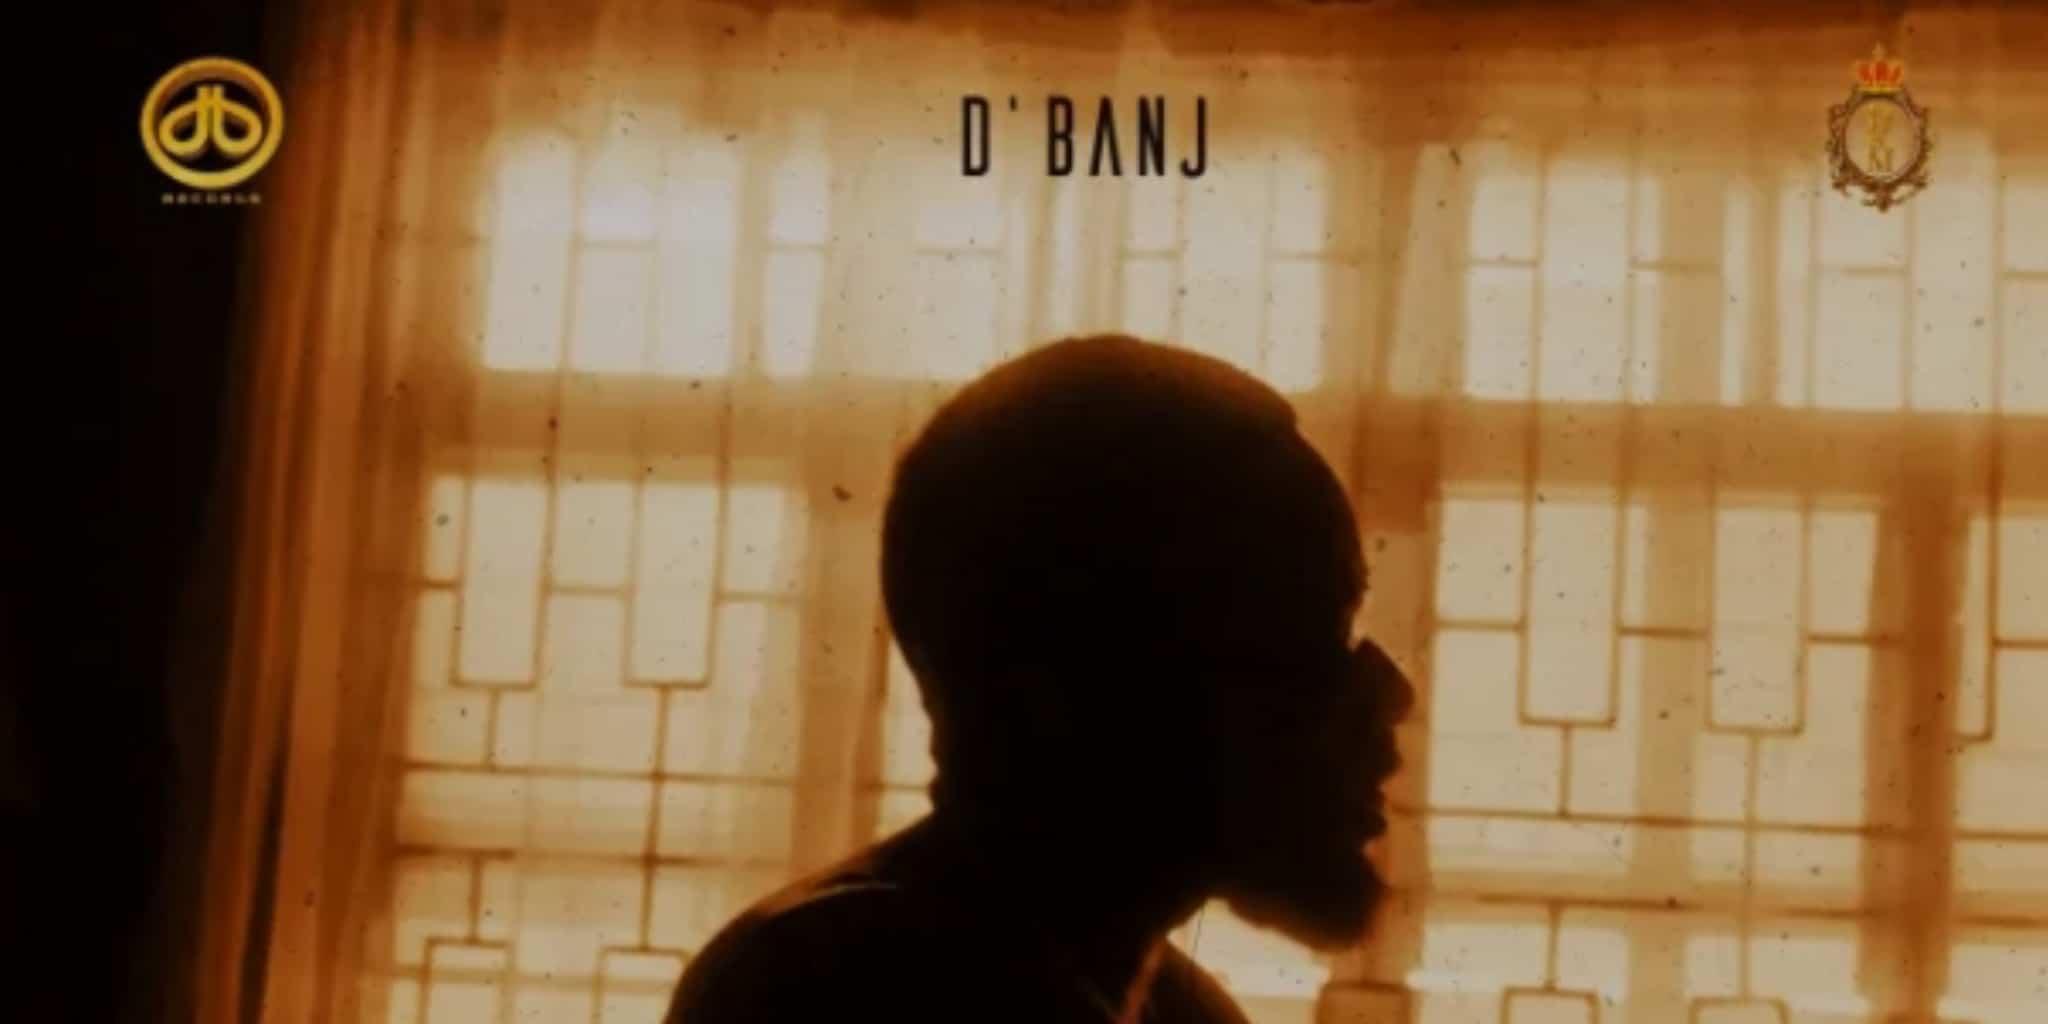 Music: D'banj - Stress Free (Chapter 1)